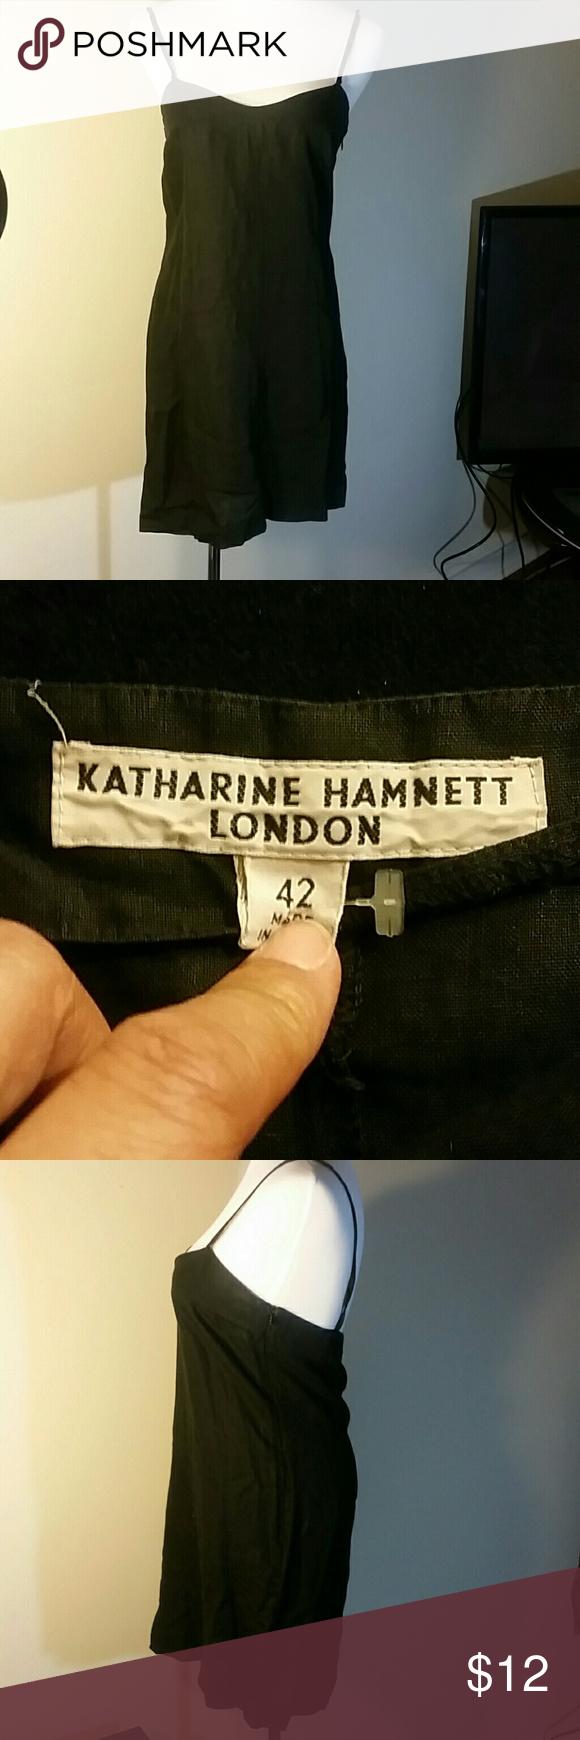 100% Linen dress Black spaghetti strap dress European 42 Katharine Hamnett Dresses Mini